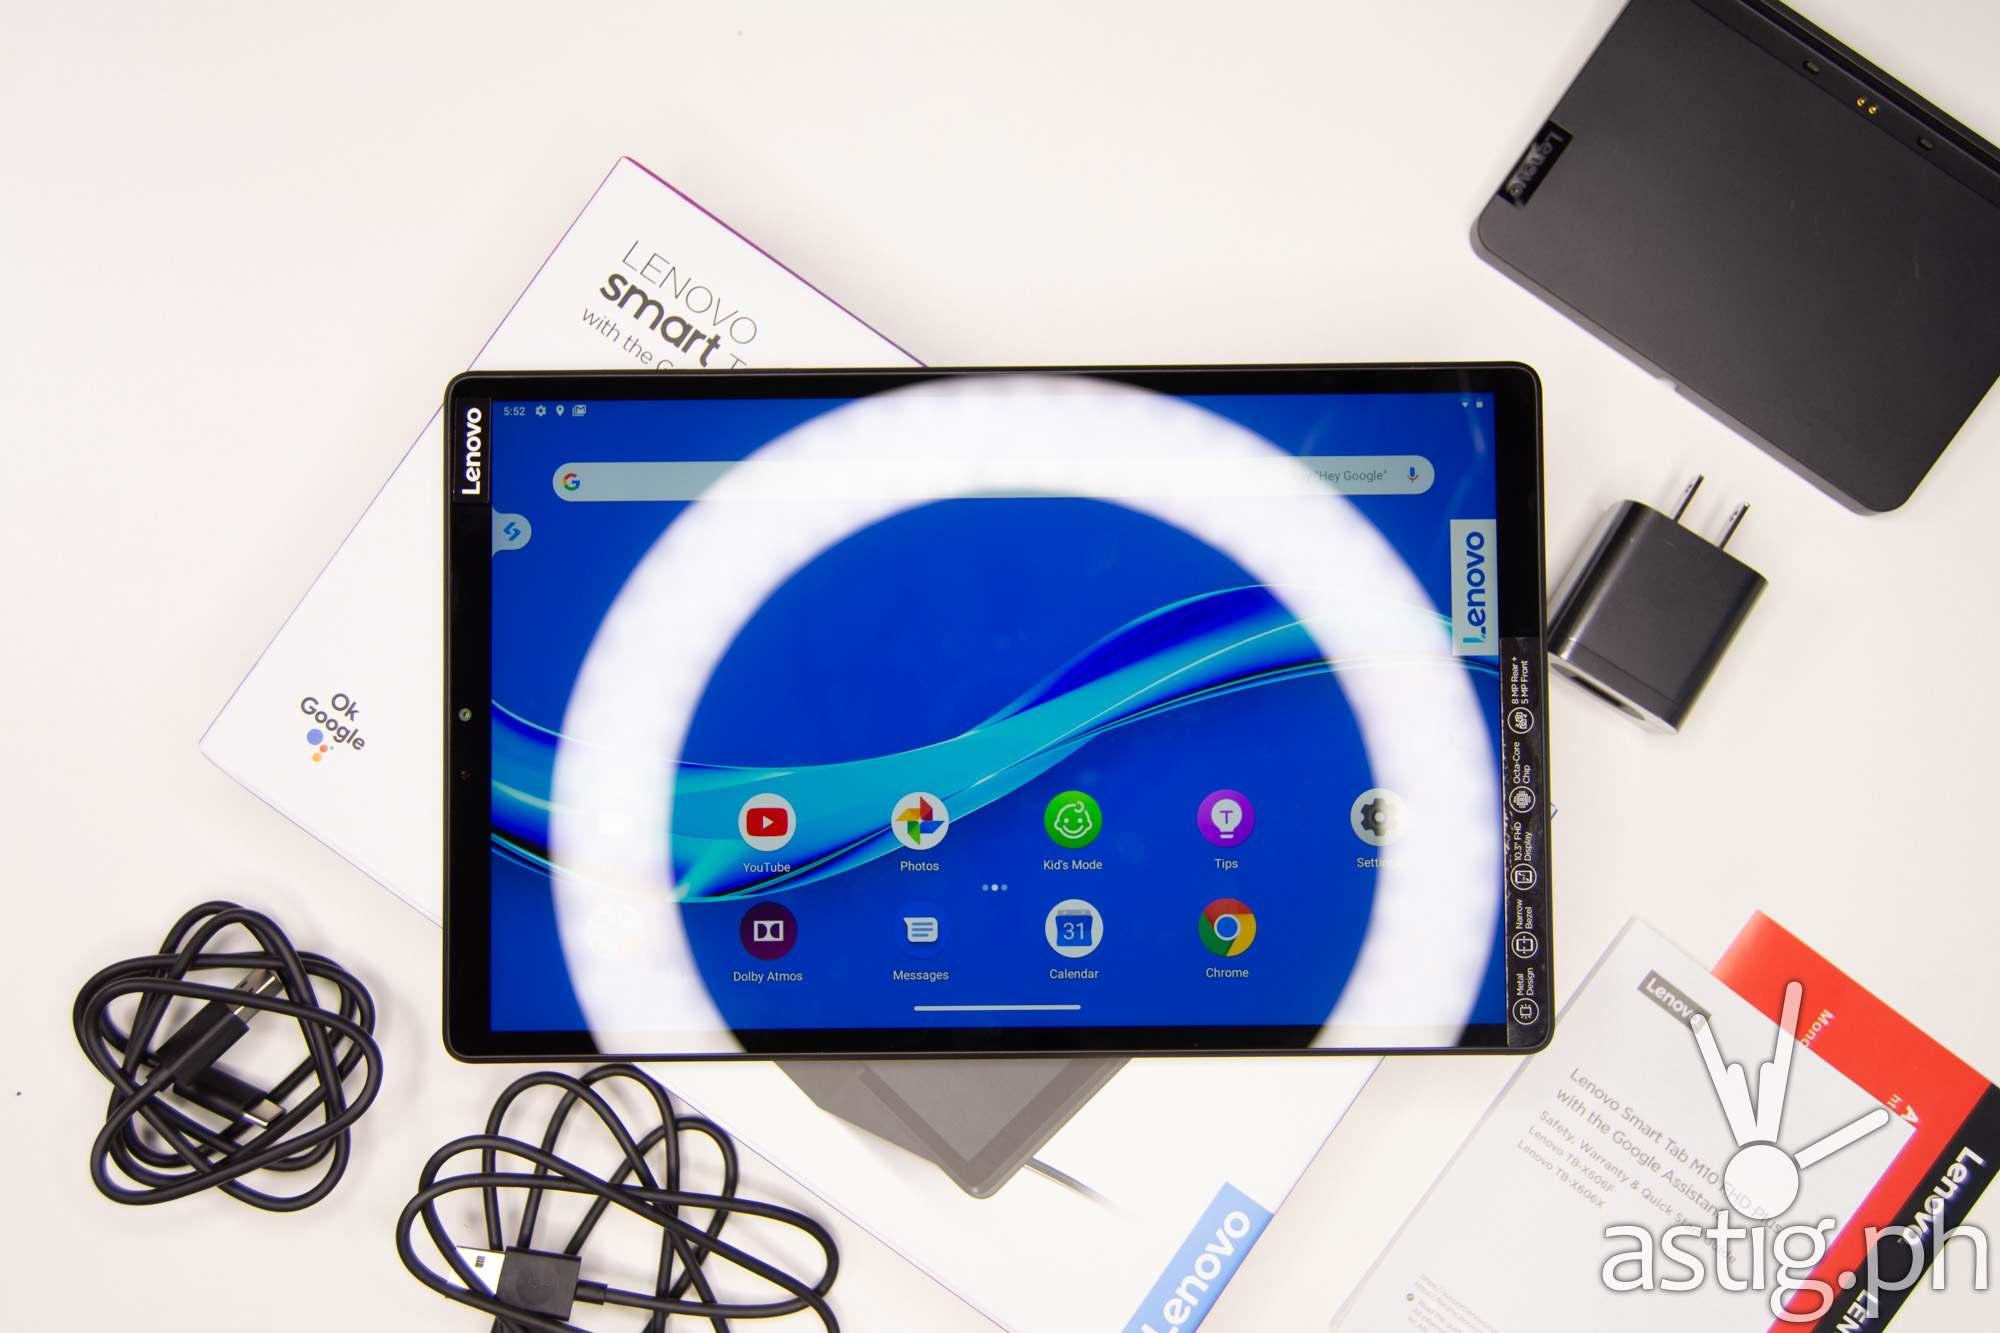 Flatlay landscape - Lenovo Smart Tab M10 FHD Plus (Philippines)